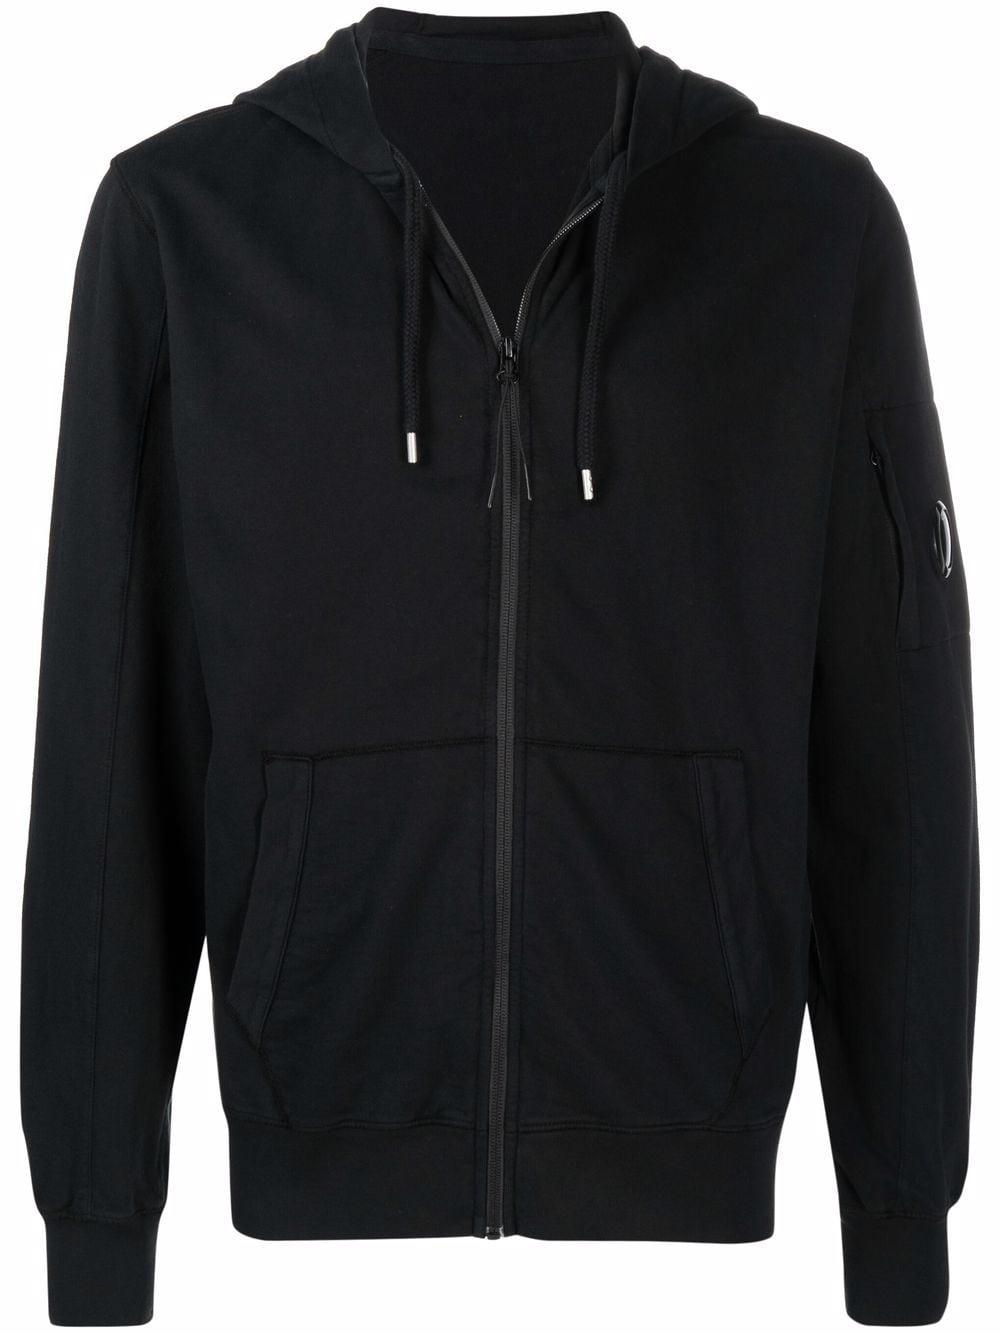 zip sweatshirt man black in cotton C.P. COMPANY | Sweatshirts | 11CMSS077A002246G999